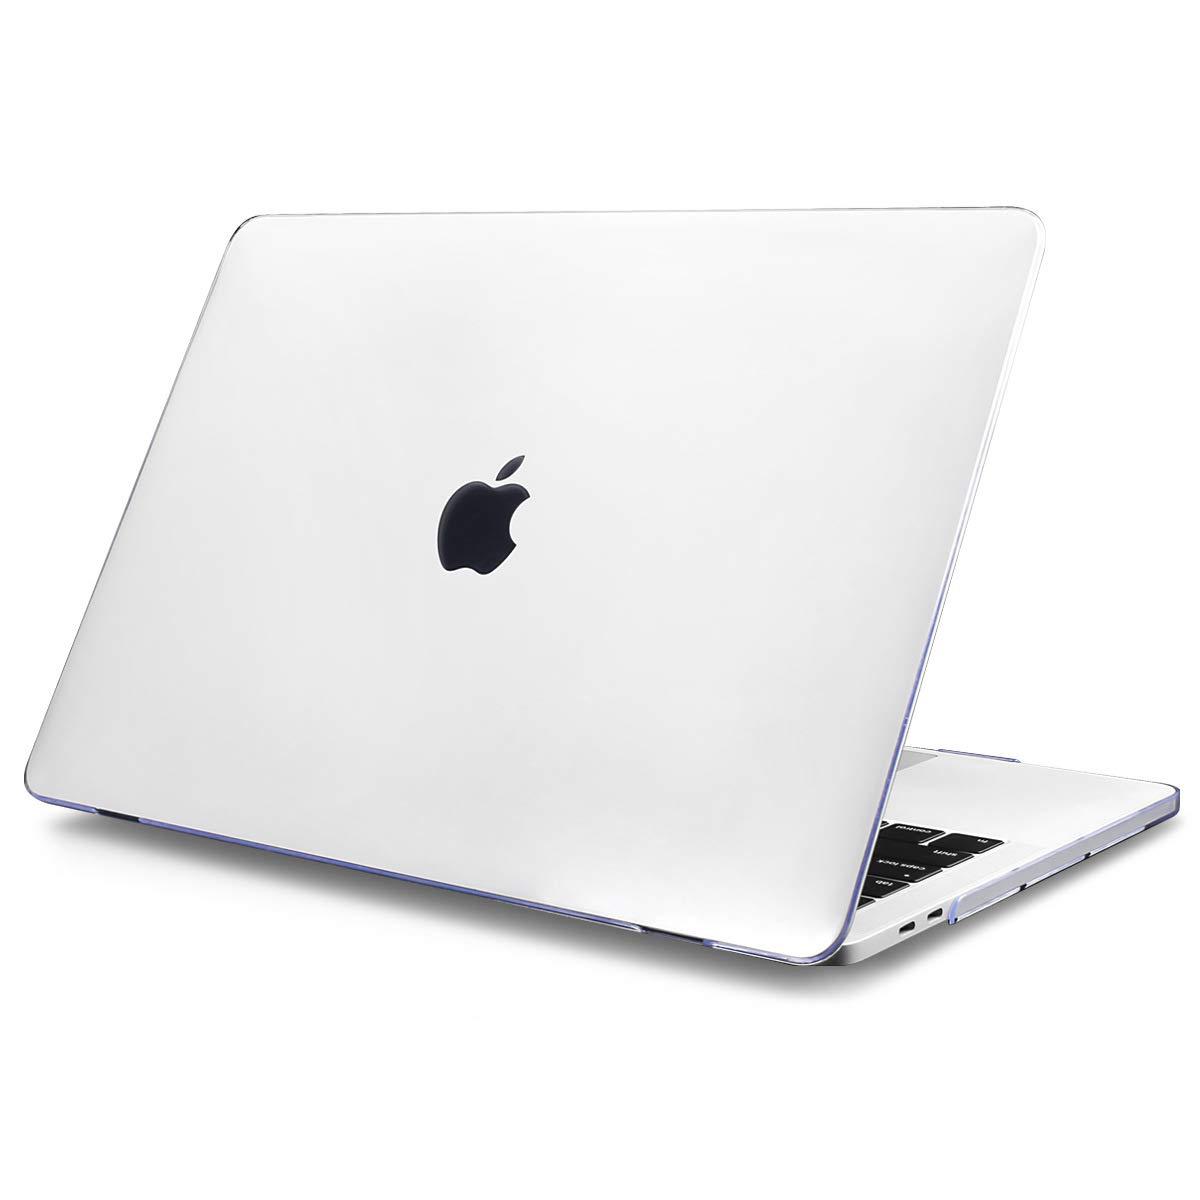 Azul Profundo Batianda Funda Dura para 2019 2018 MacBook Air 13 con Retina A1932 USB-C Port Carcasa R/ígida de Pl/ástico Cubierta Case Cover